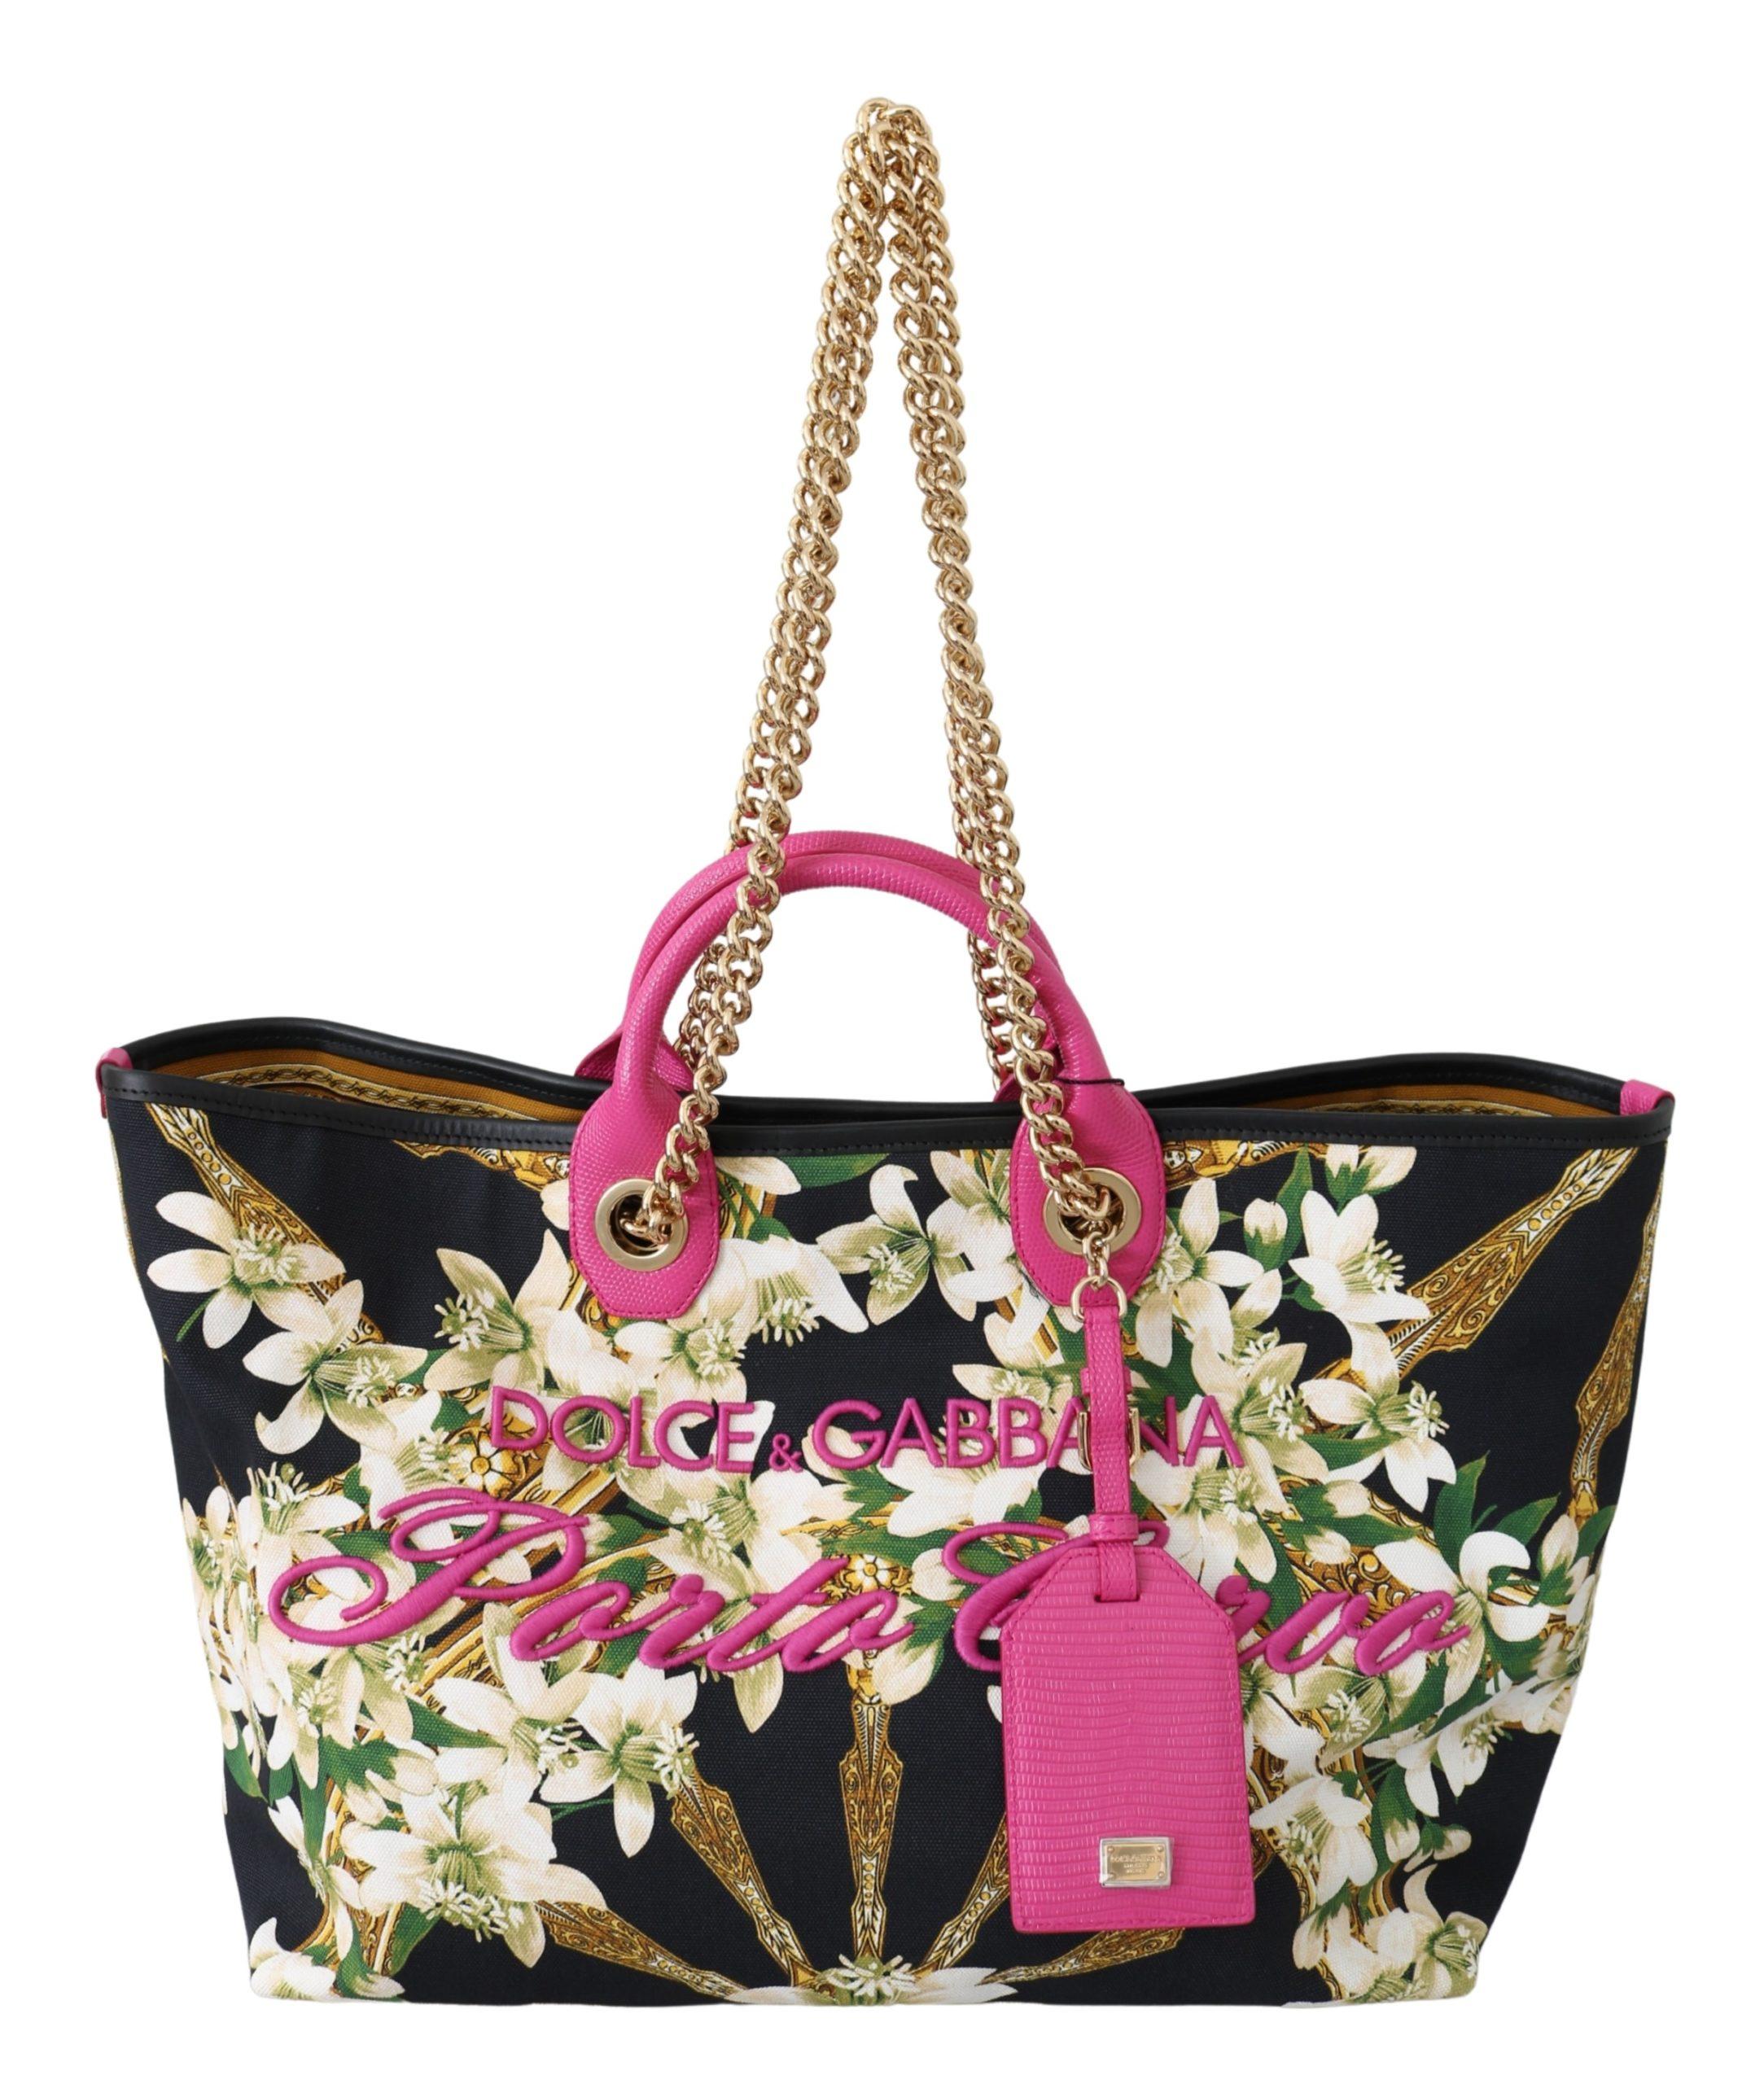 Dolce & Gabbana Women's Floral Porto Cervo Tote Bag Black VAS9792